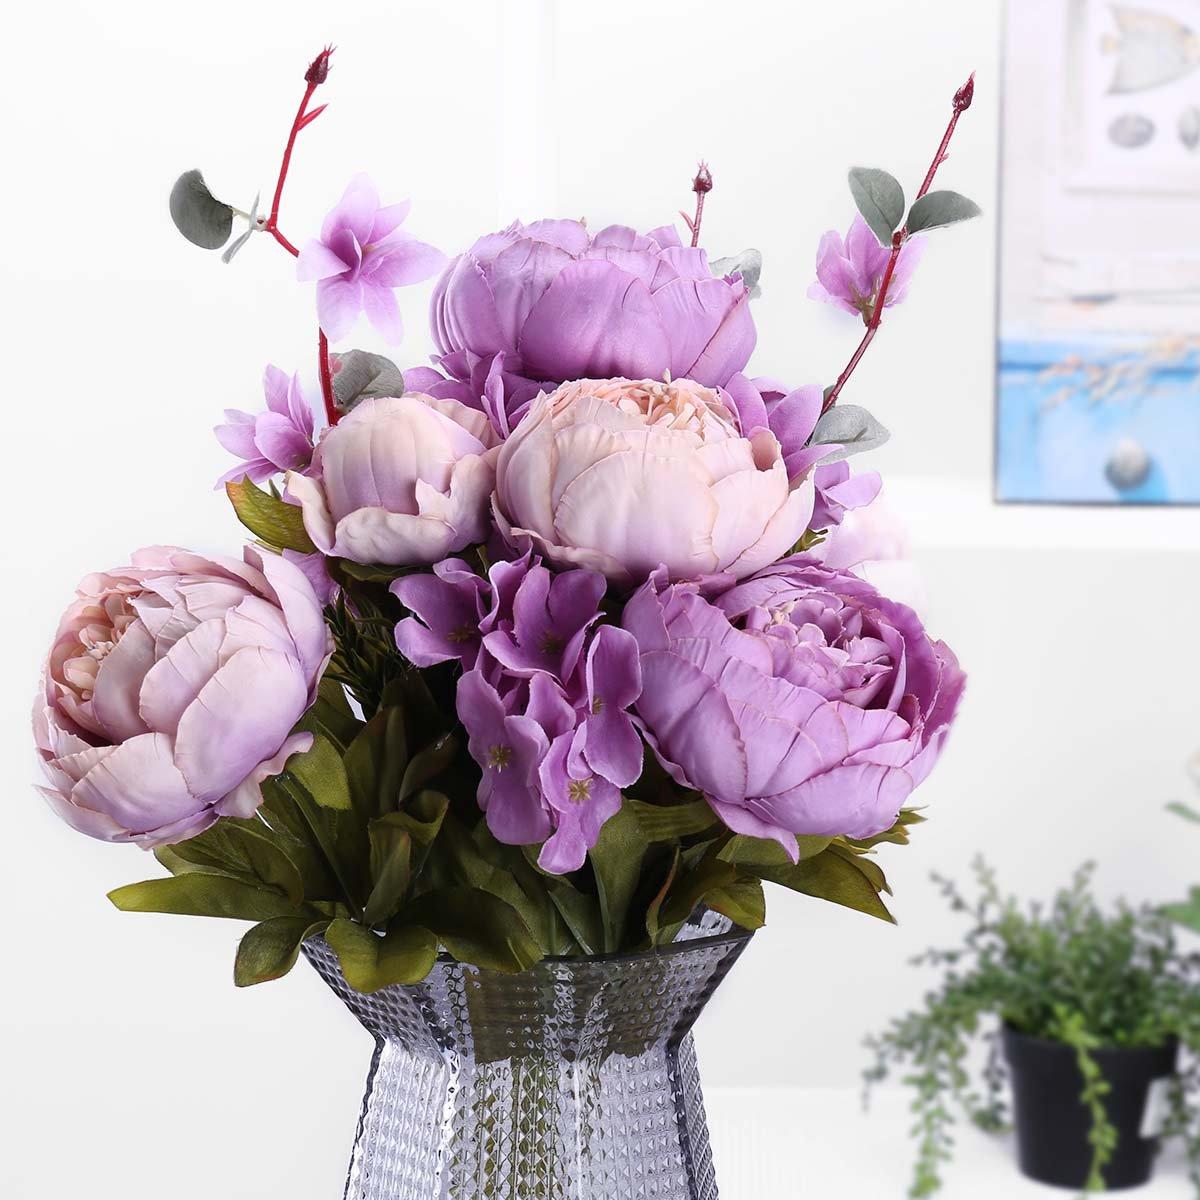 Judy Silk Flowers Peonies Outdoor Artificial Flower Arrangements